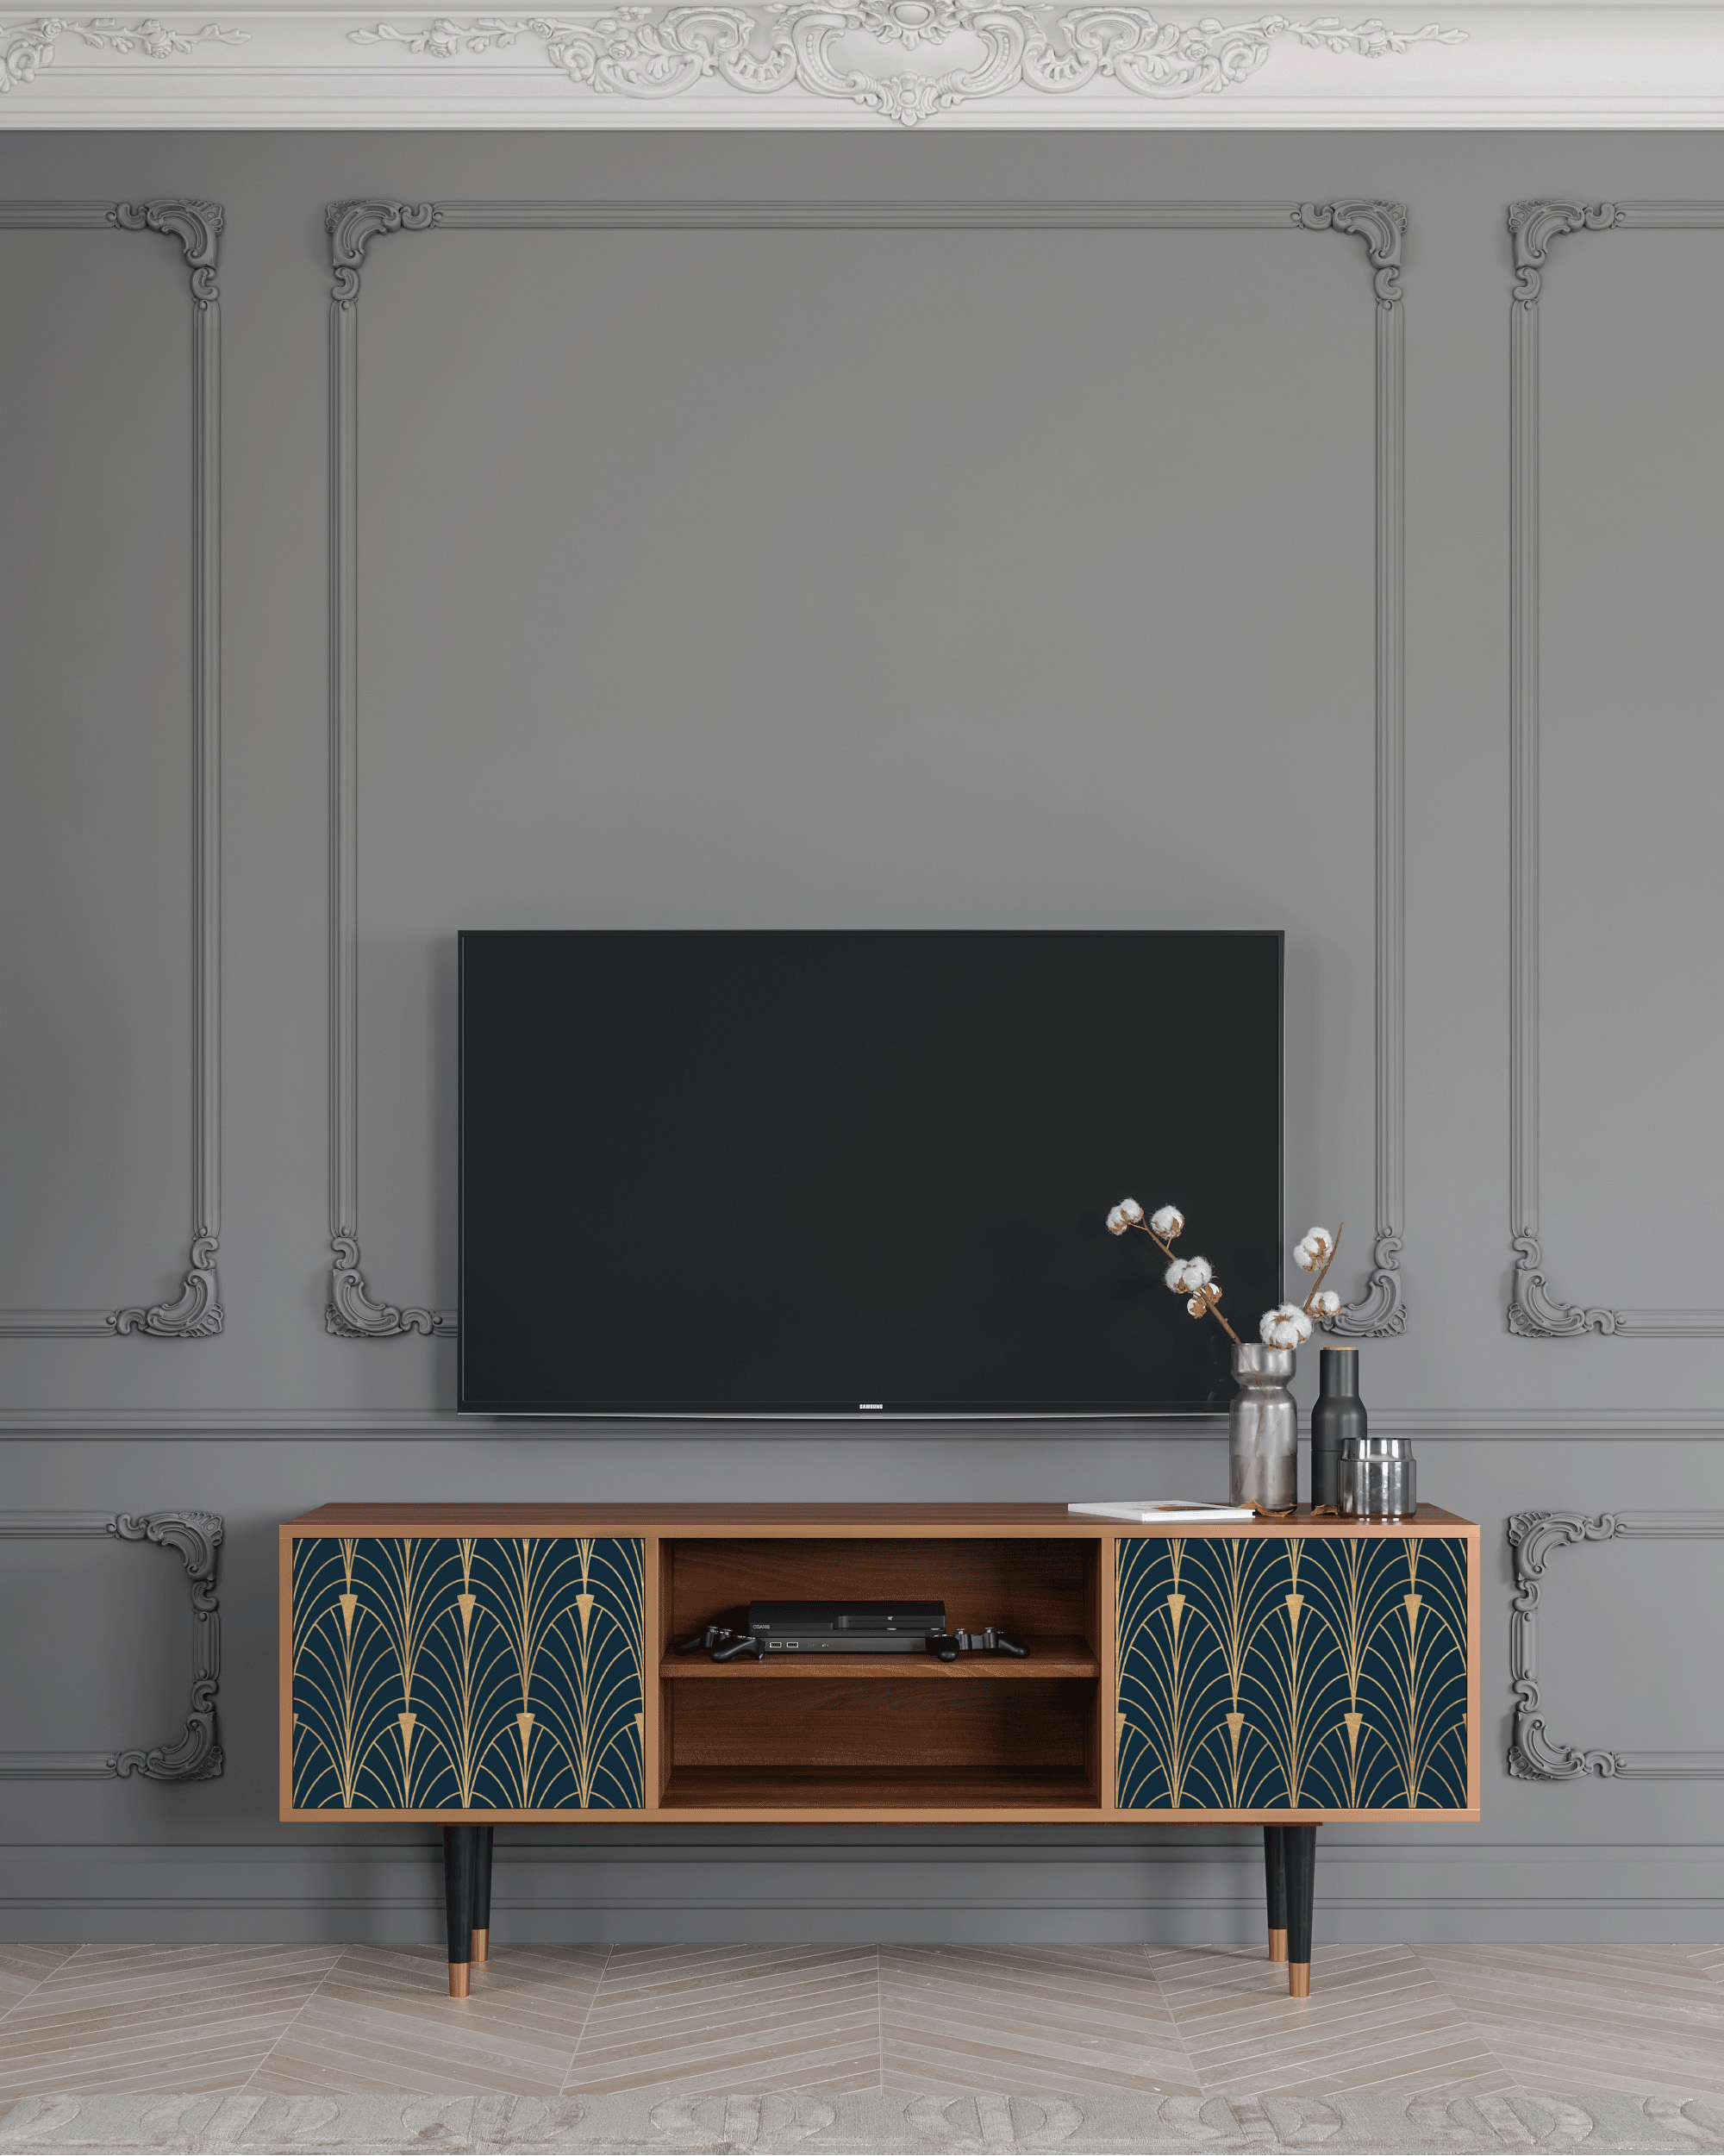 Meuble TV bleu et jaune 170cm 2 portes